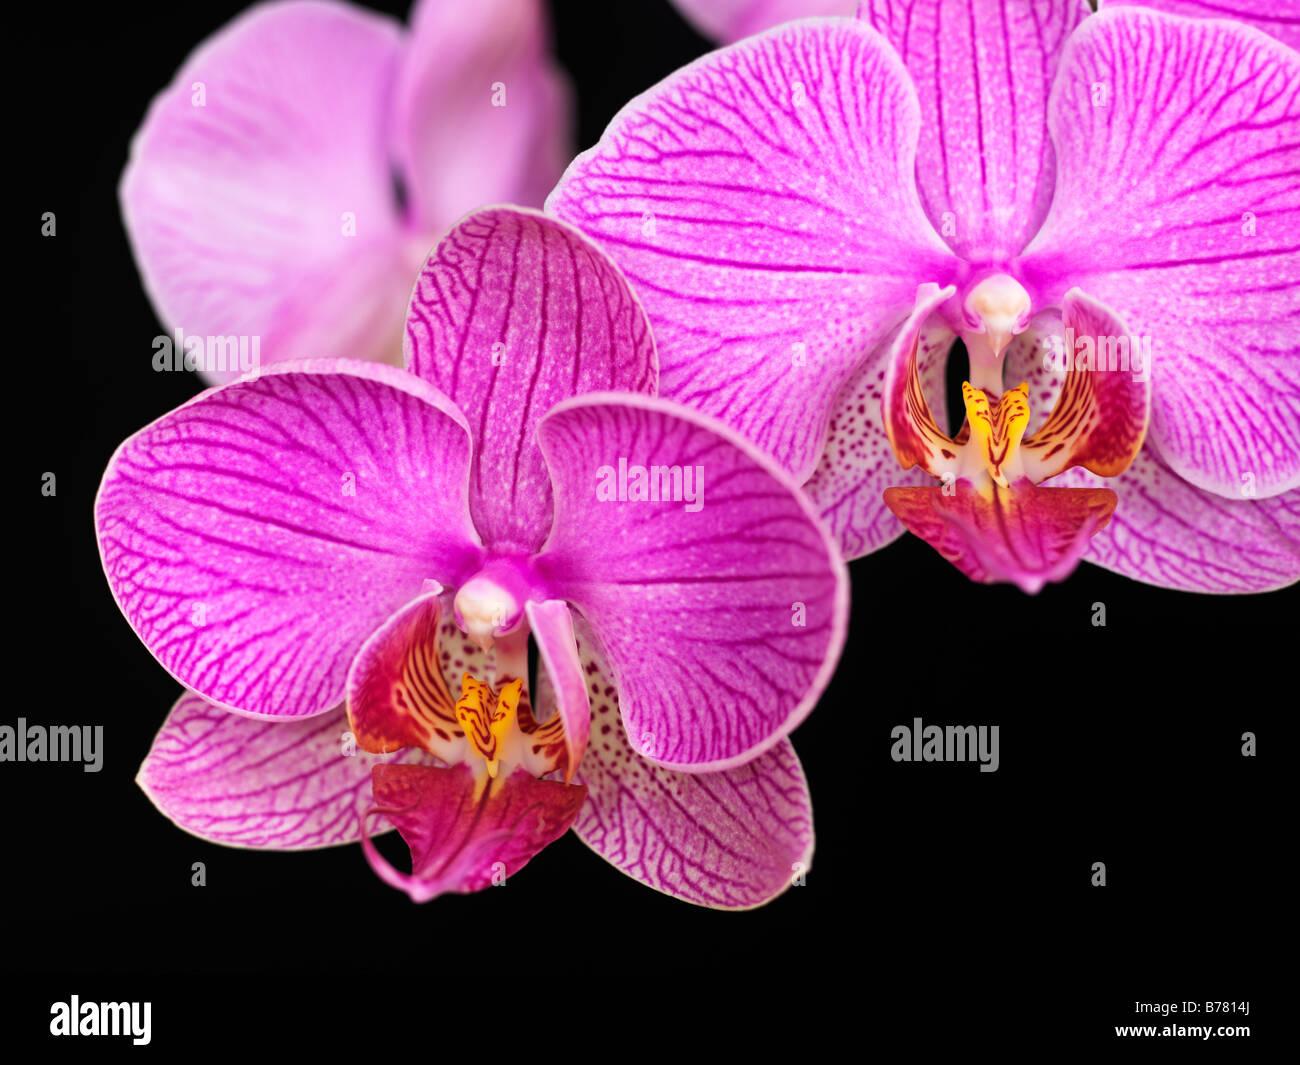 Phalaenopsis Orchid - Stock Image